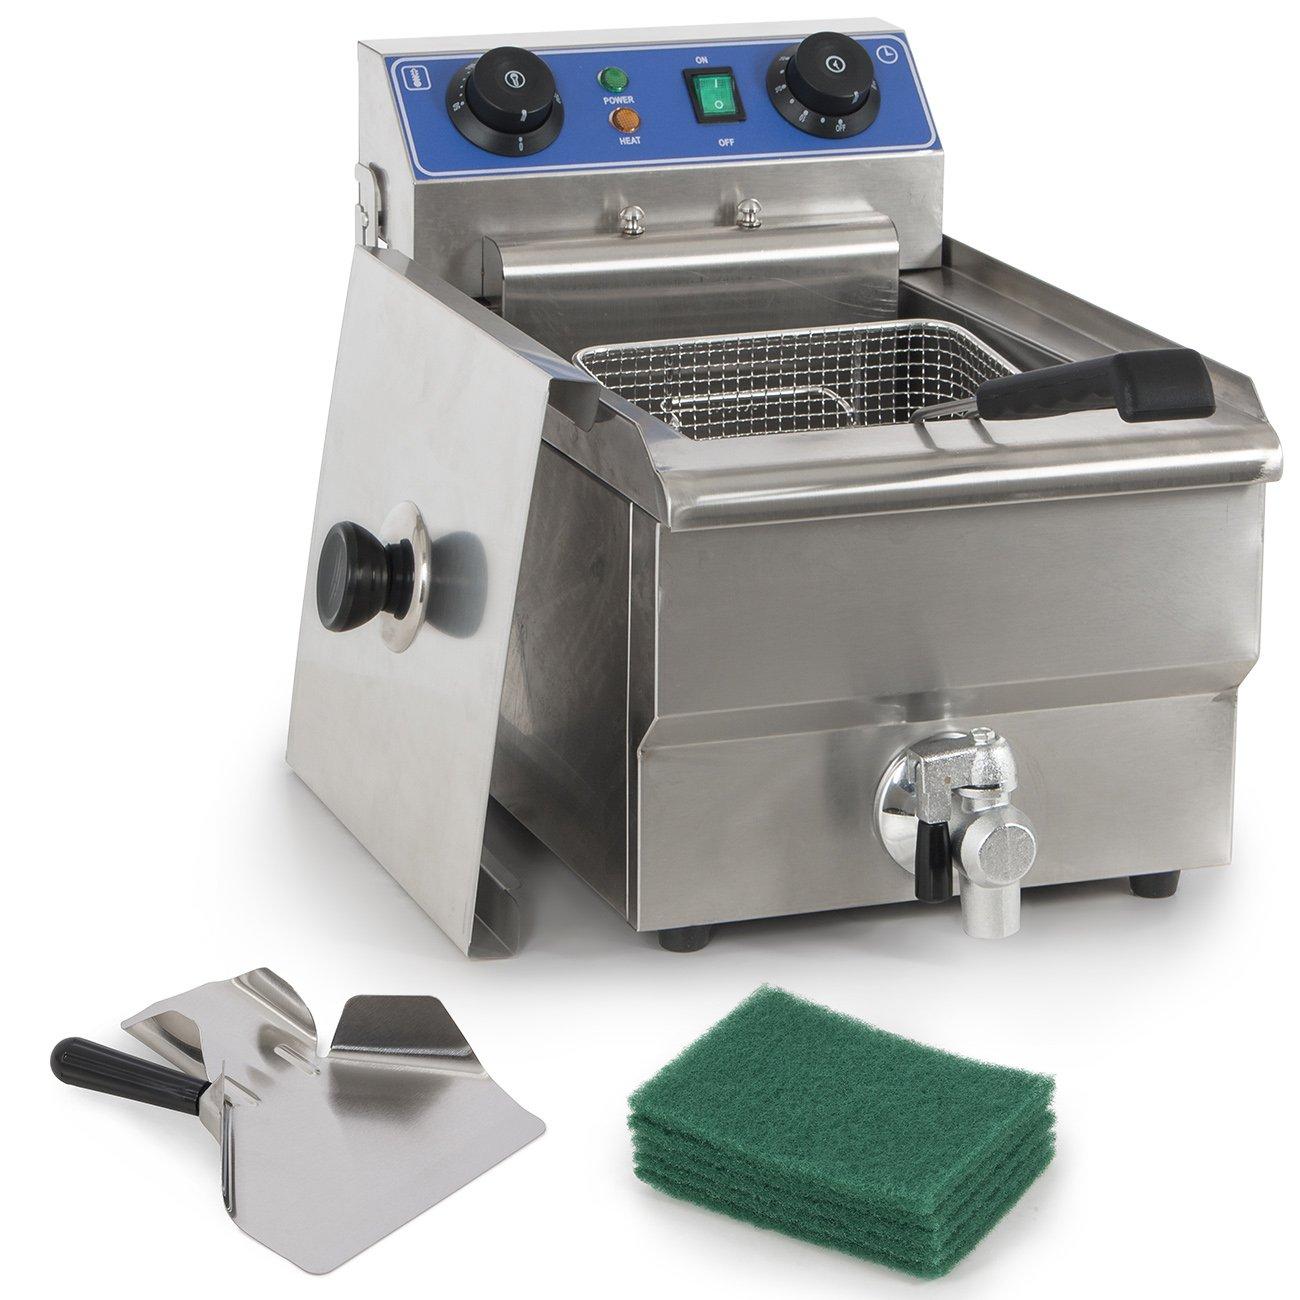 ARKSEN 1500W Stainless Steel 10 Liter Electric Deep Fryer Portable Drain, UL Listed